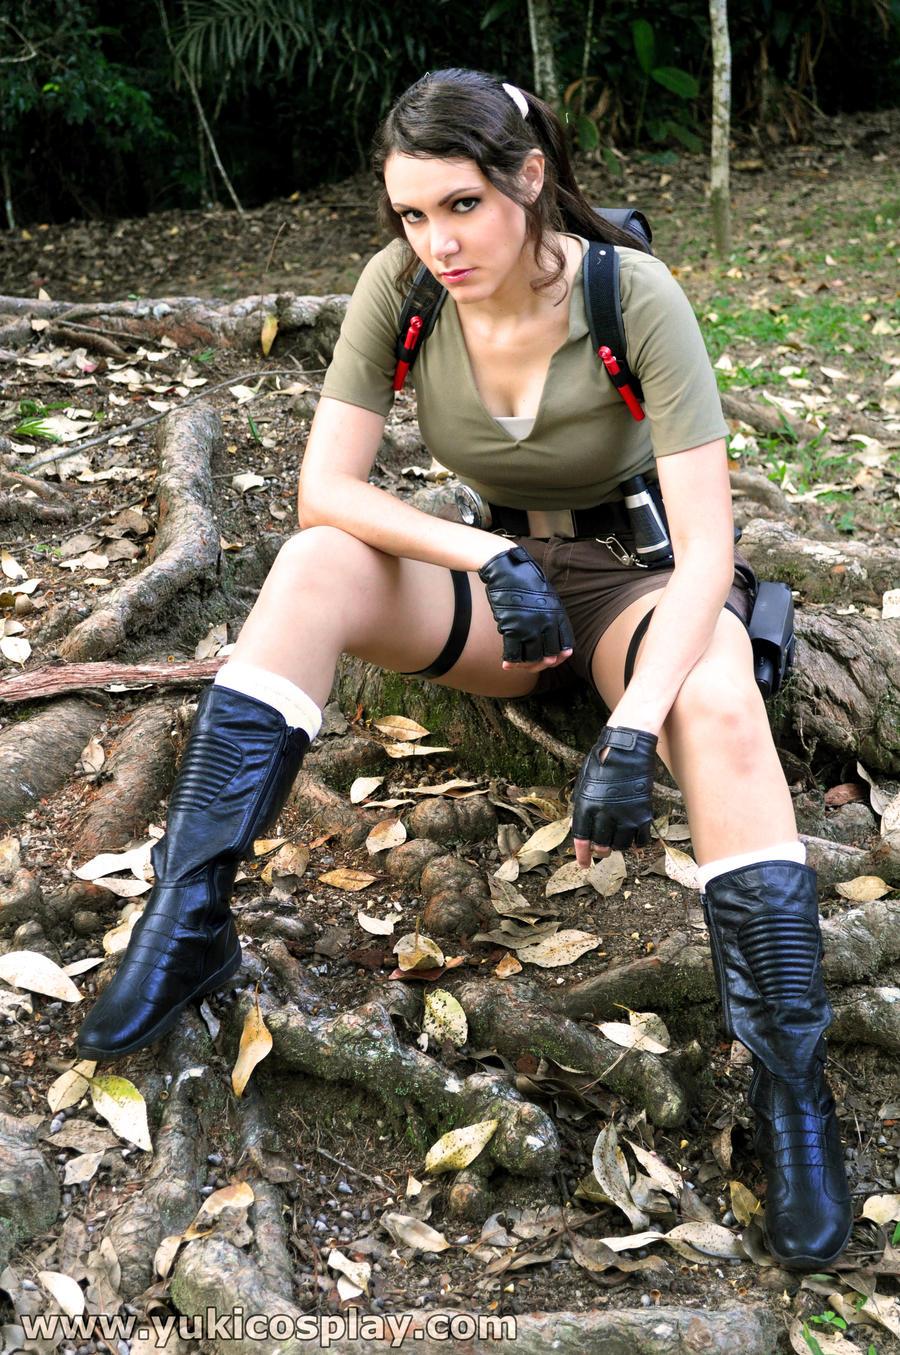 Lara Croft Tomb Raider Cosplay by Yukilefay